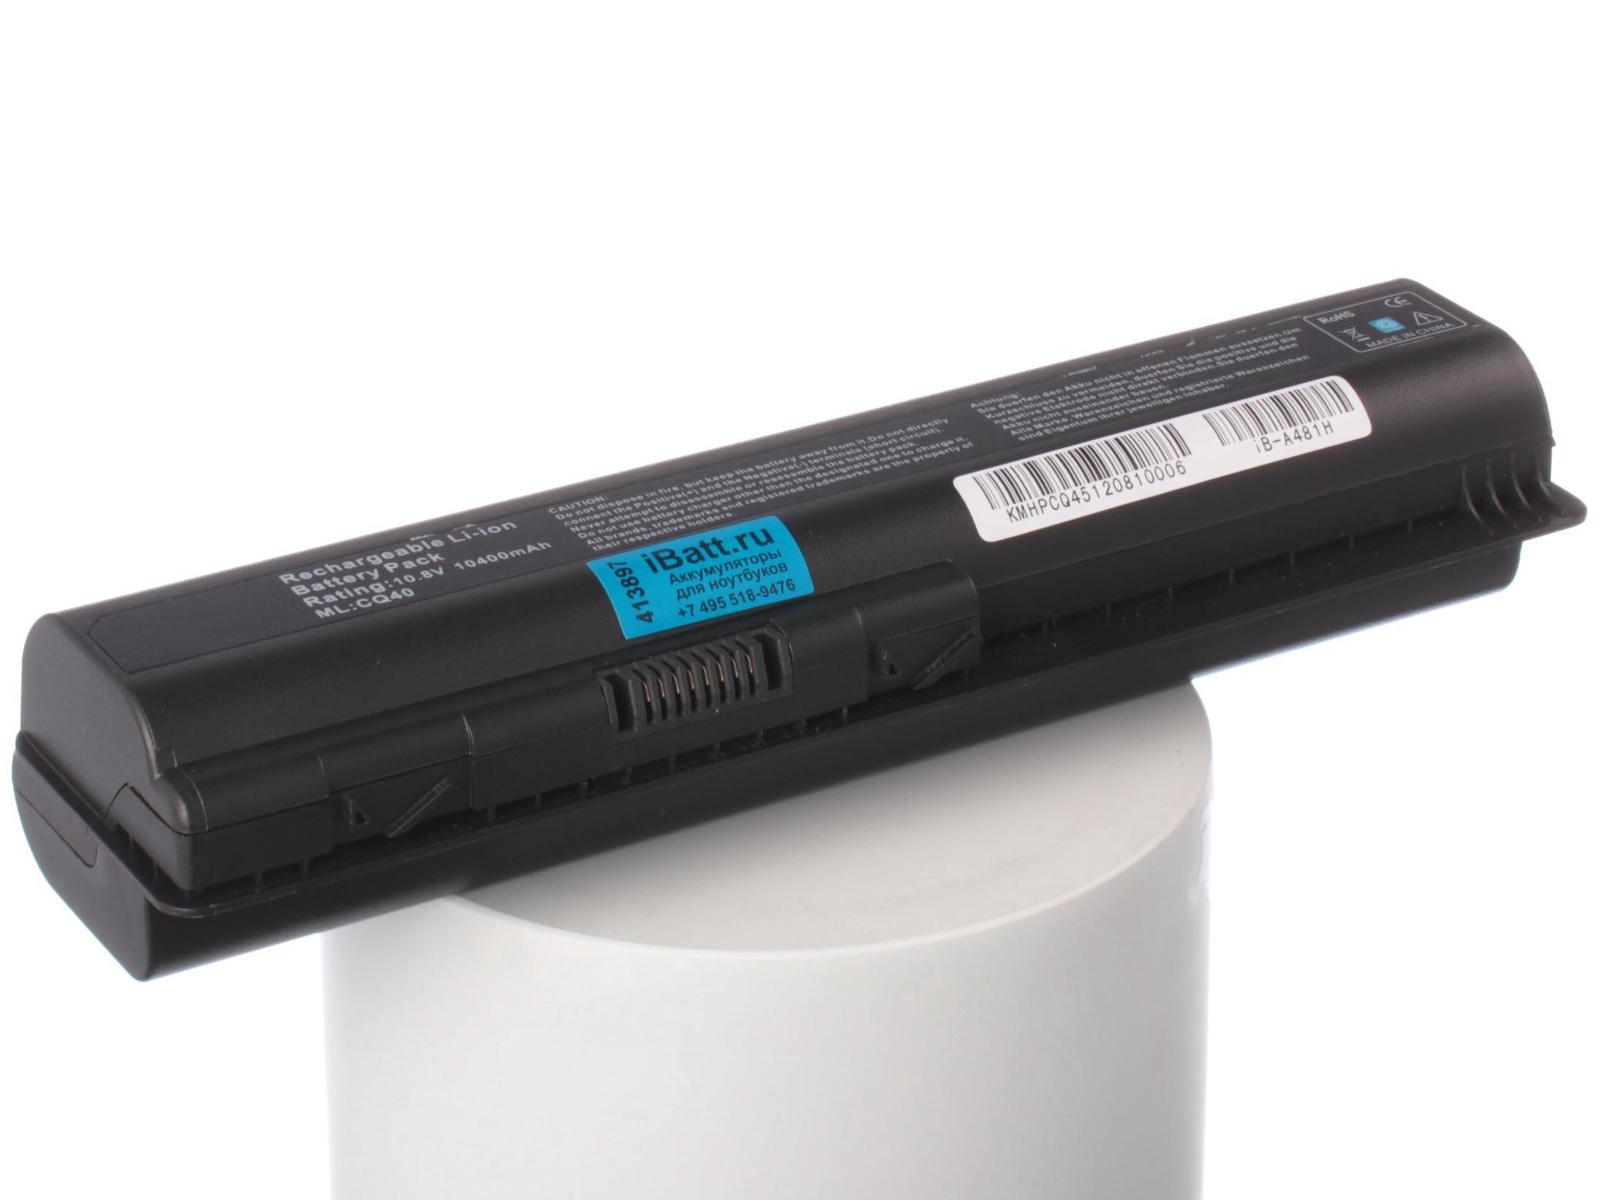 Аккумулятор для ноутбука iBatt для HP-Compaq Pavilion dv5-1010ez, Pavilion dv5-1050er, Pavilion dv5-1105el, Pavilion dv5-1199eo, Pavilion dv5-1205tx, Pavilion dv5-1251nr, Pavilion dv5-1255er, Pavilion dv6-1210er все цены